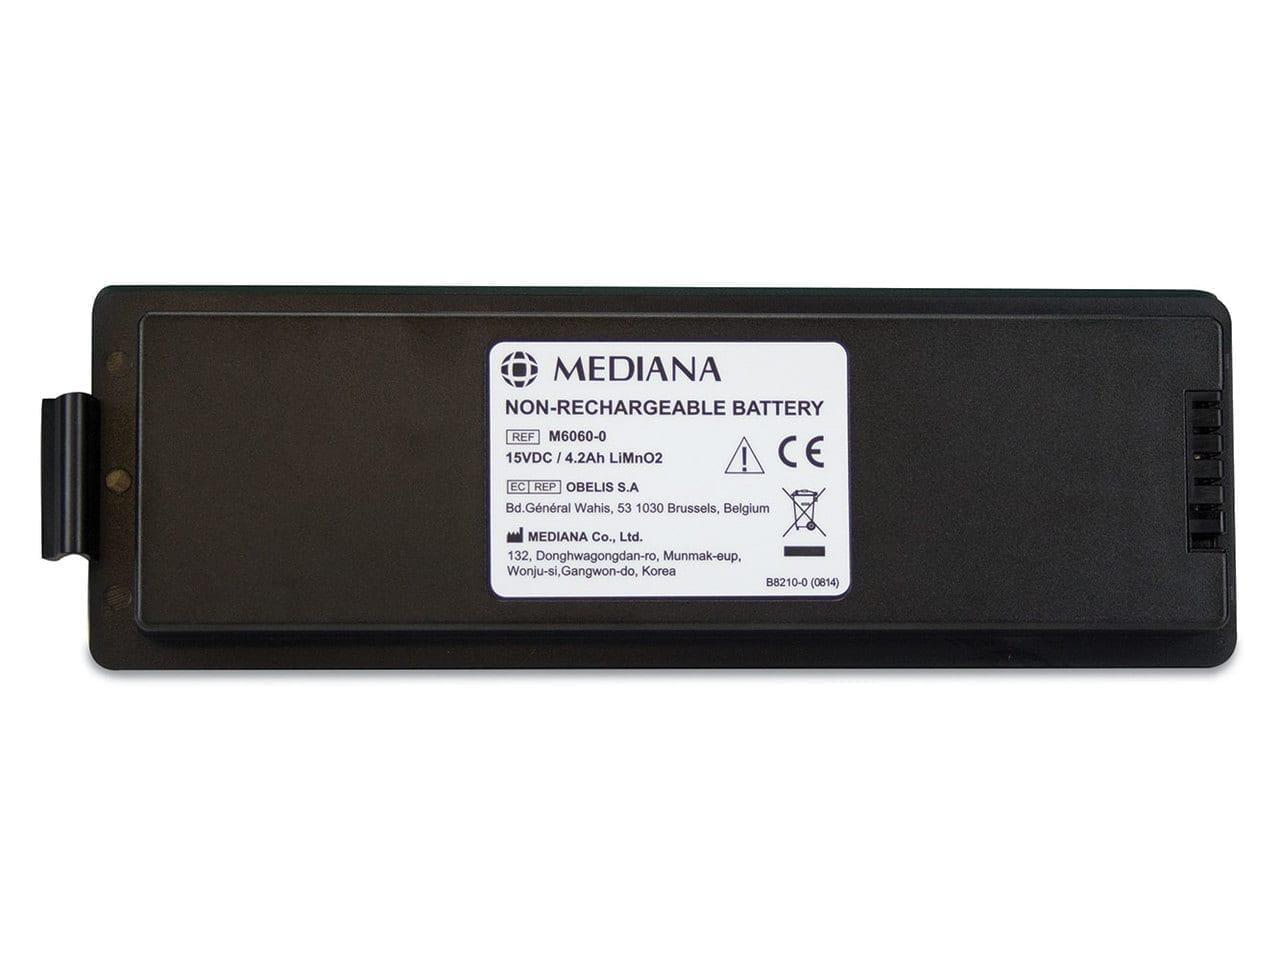 defibrillator battery Mediana A10 Battery